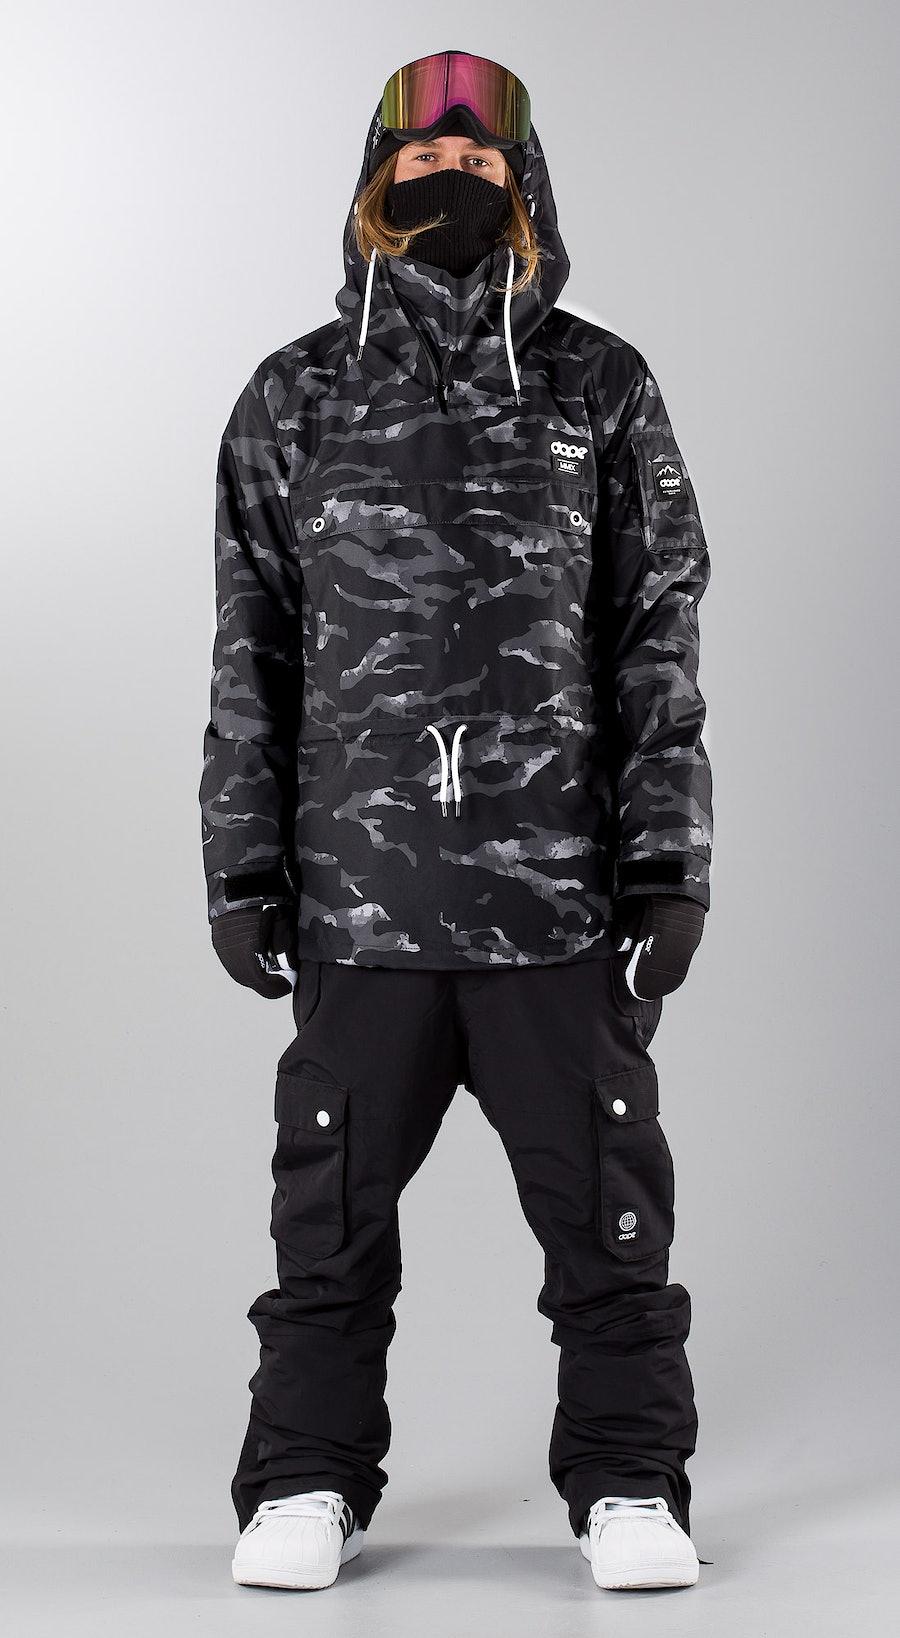 Dope Annok Black Camo Snowboardkläder Multi